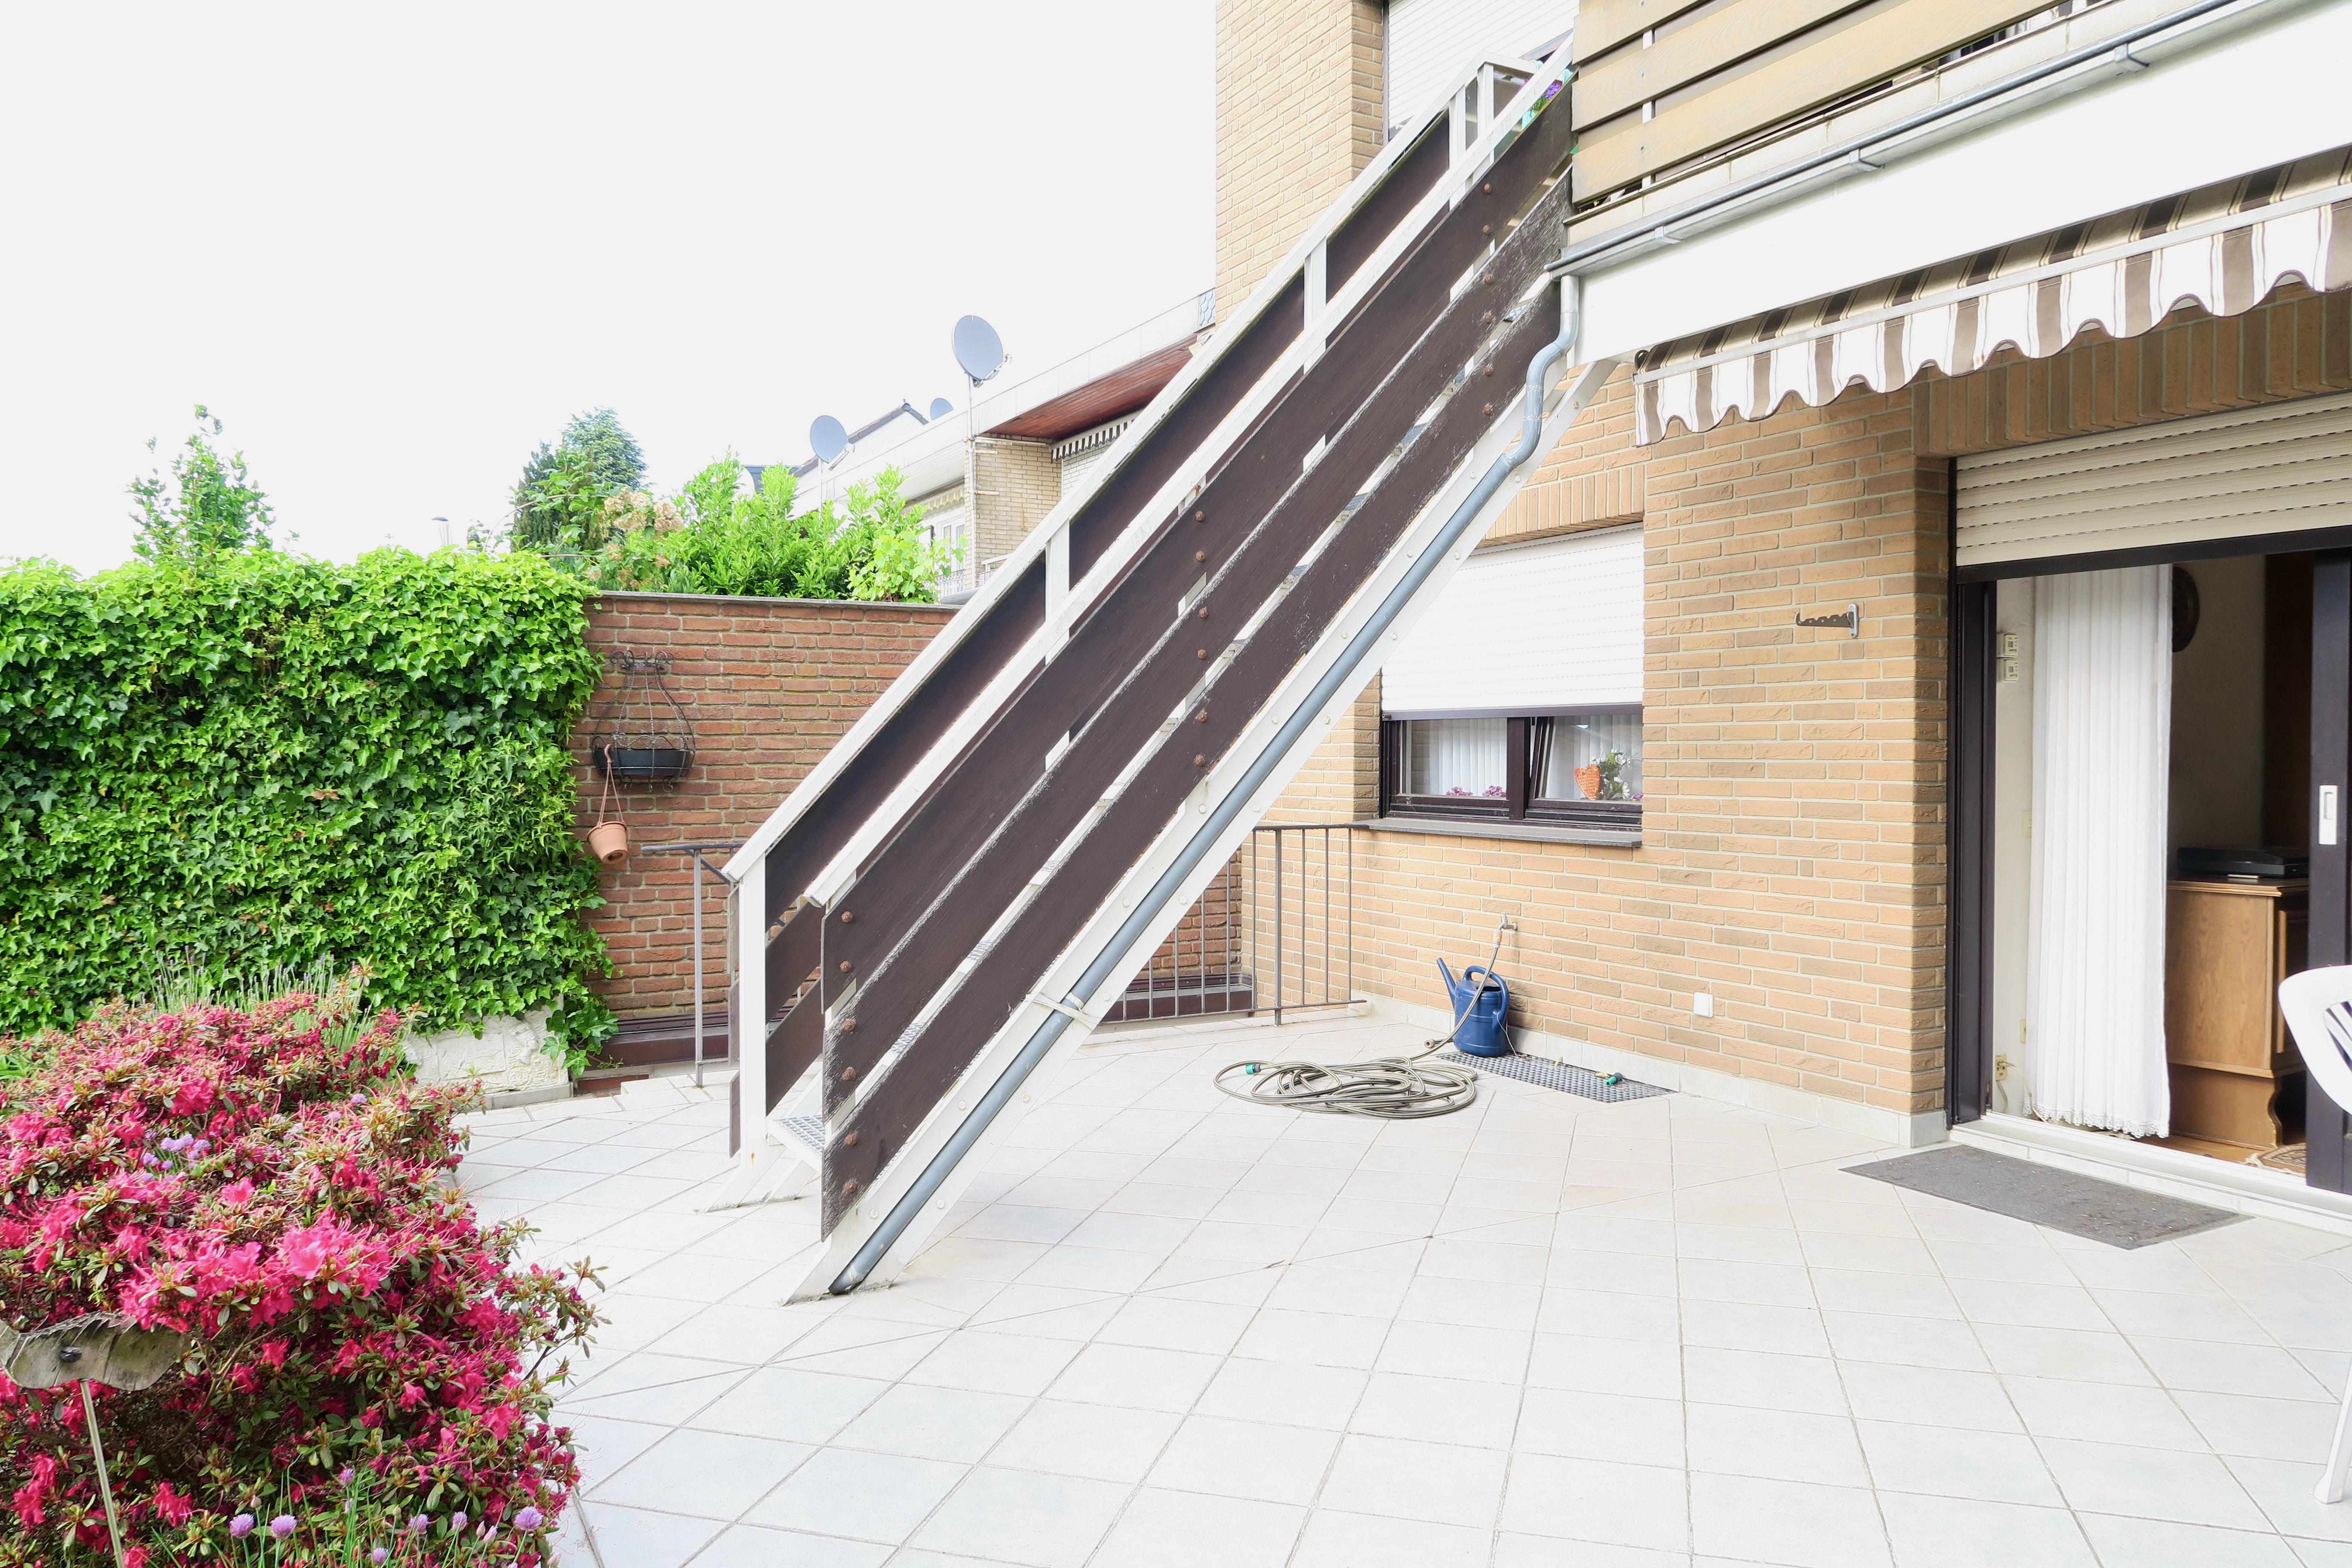 Balkontreppe.jpeg